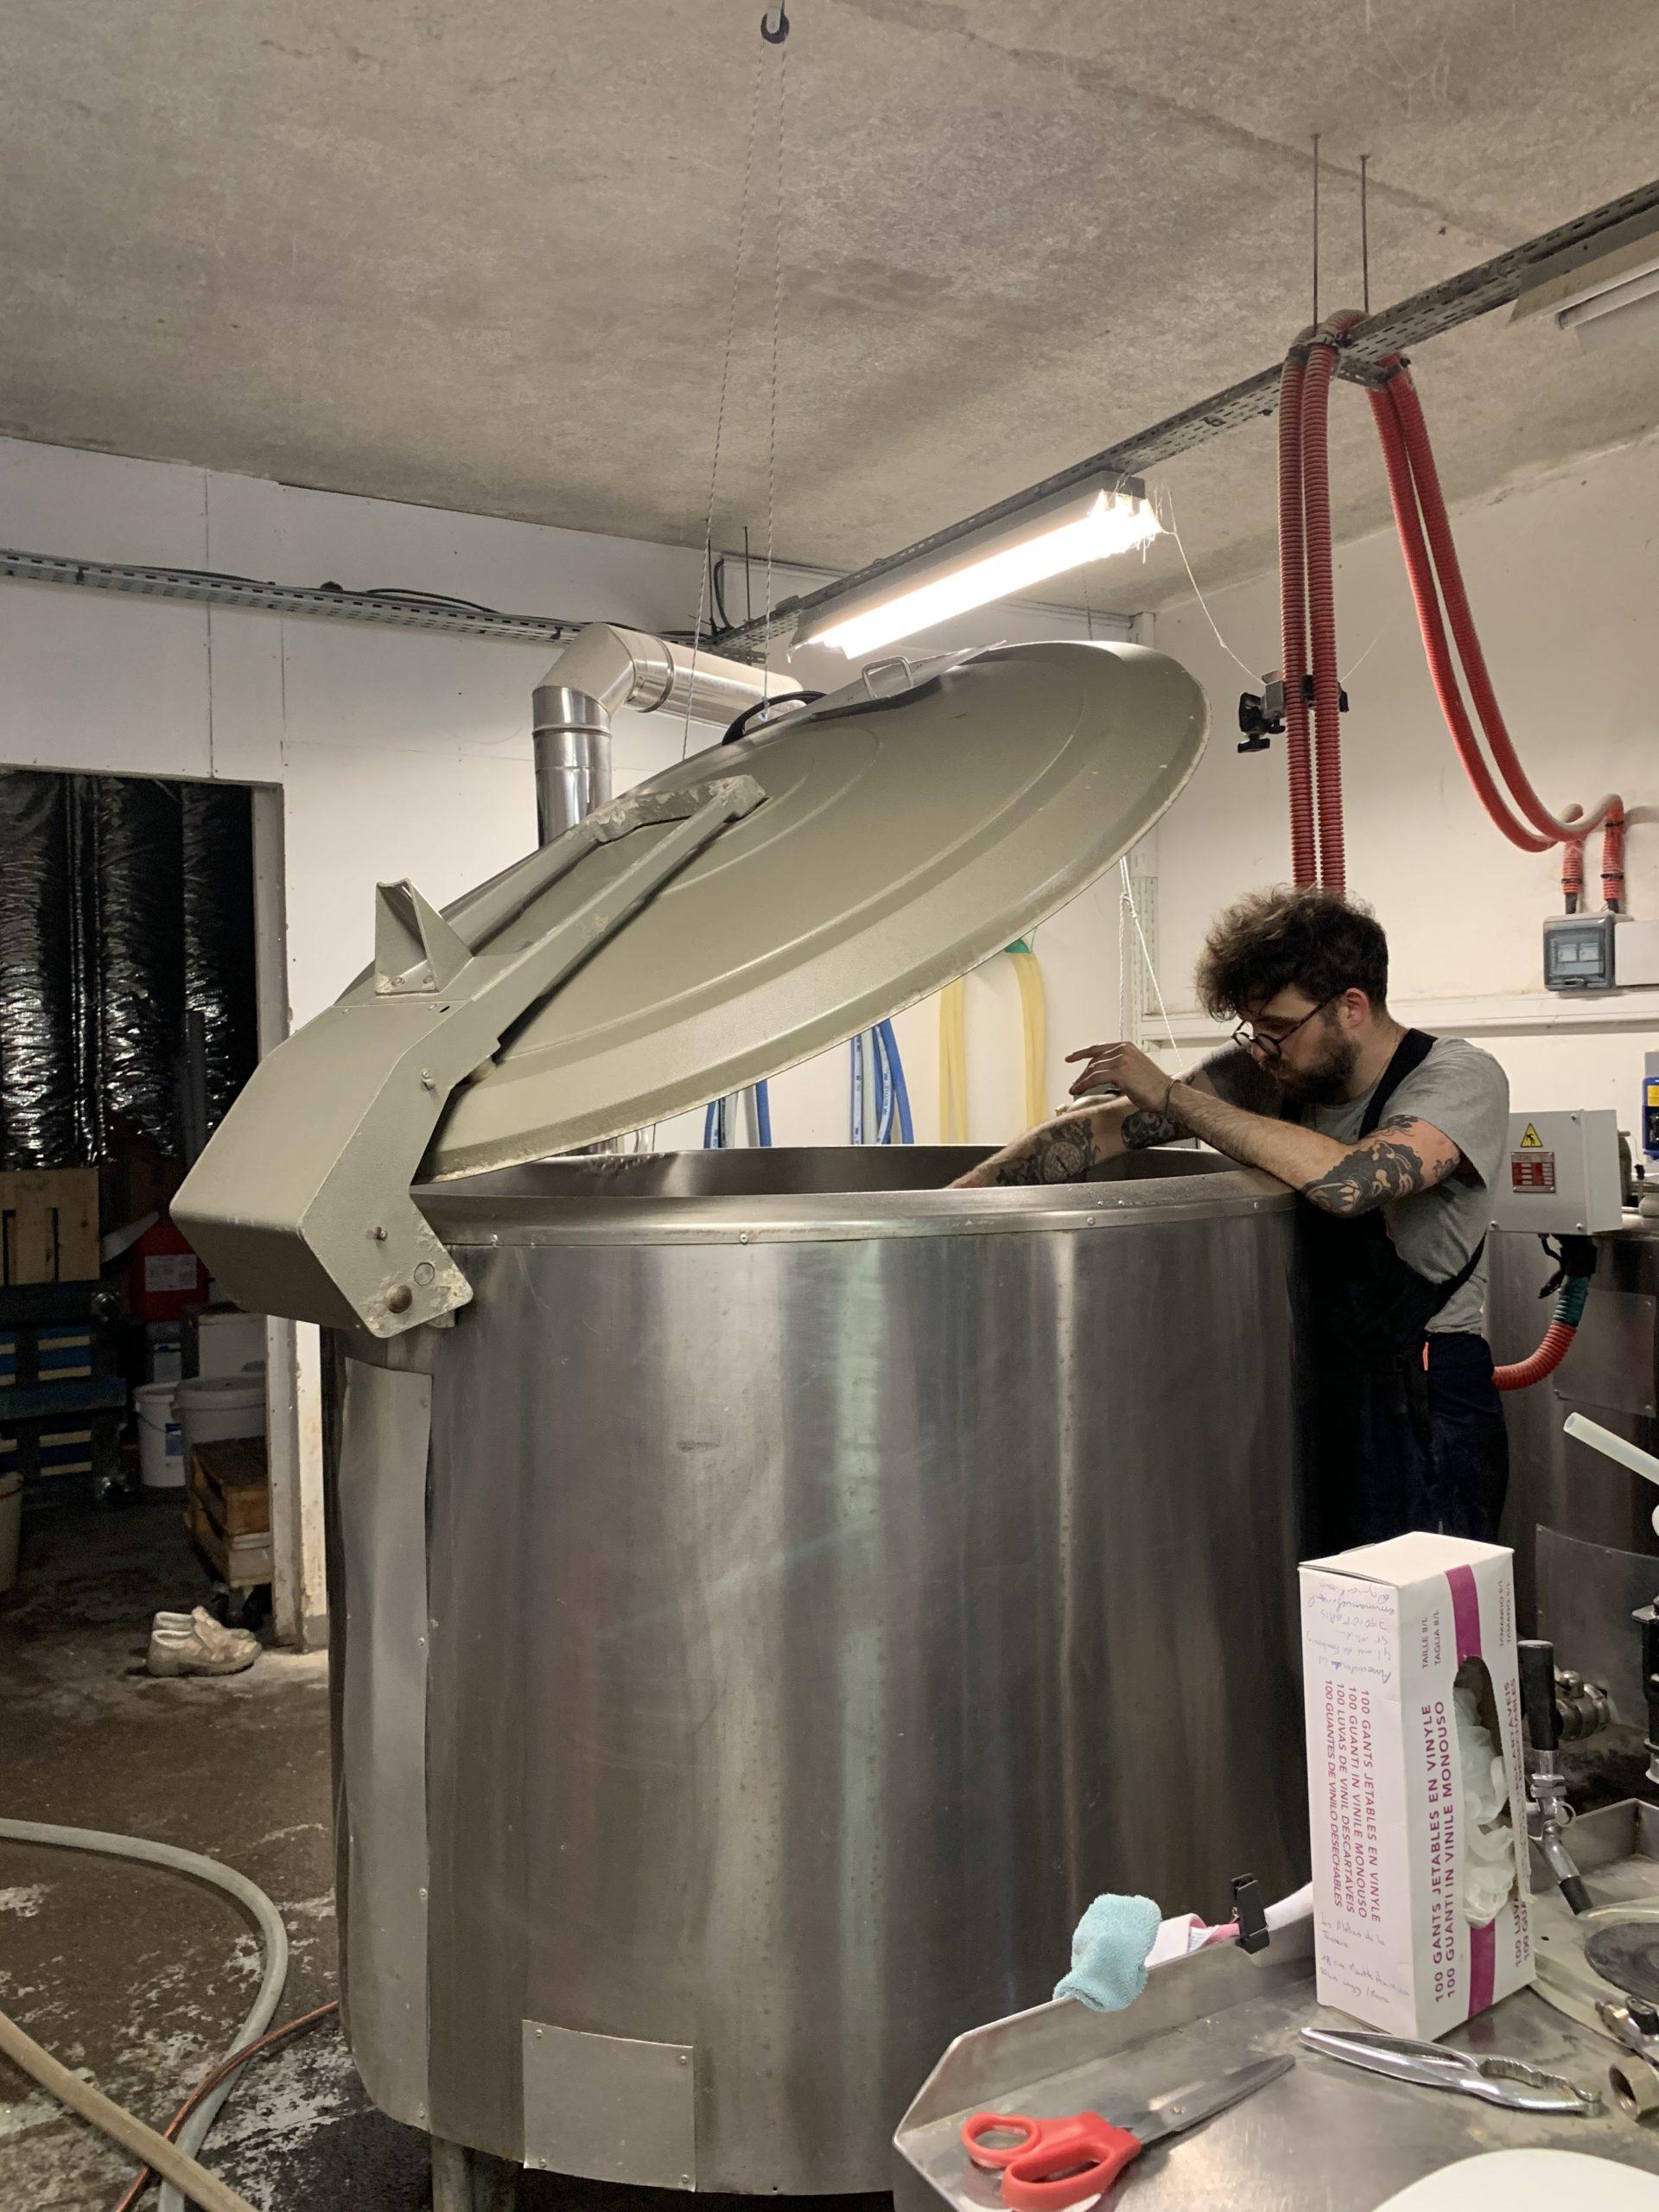 Pour une bière locale, direction la micro-brasserie La Baleine